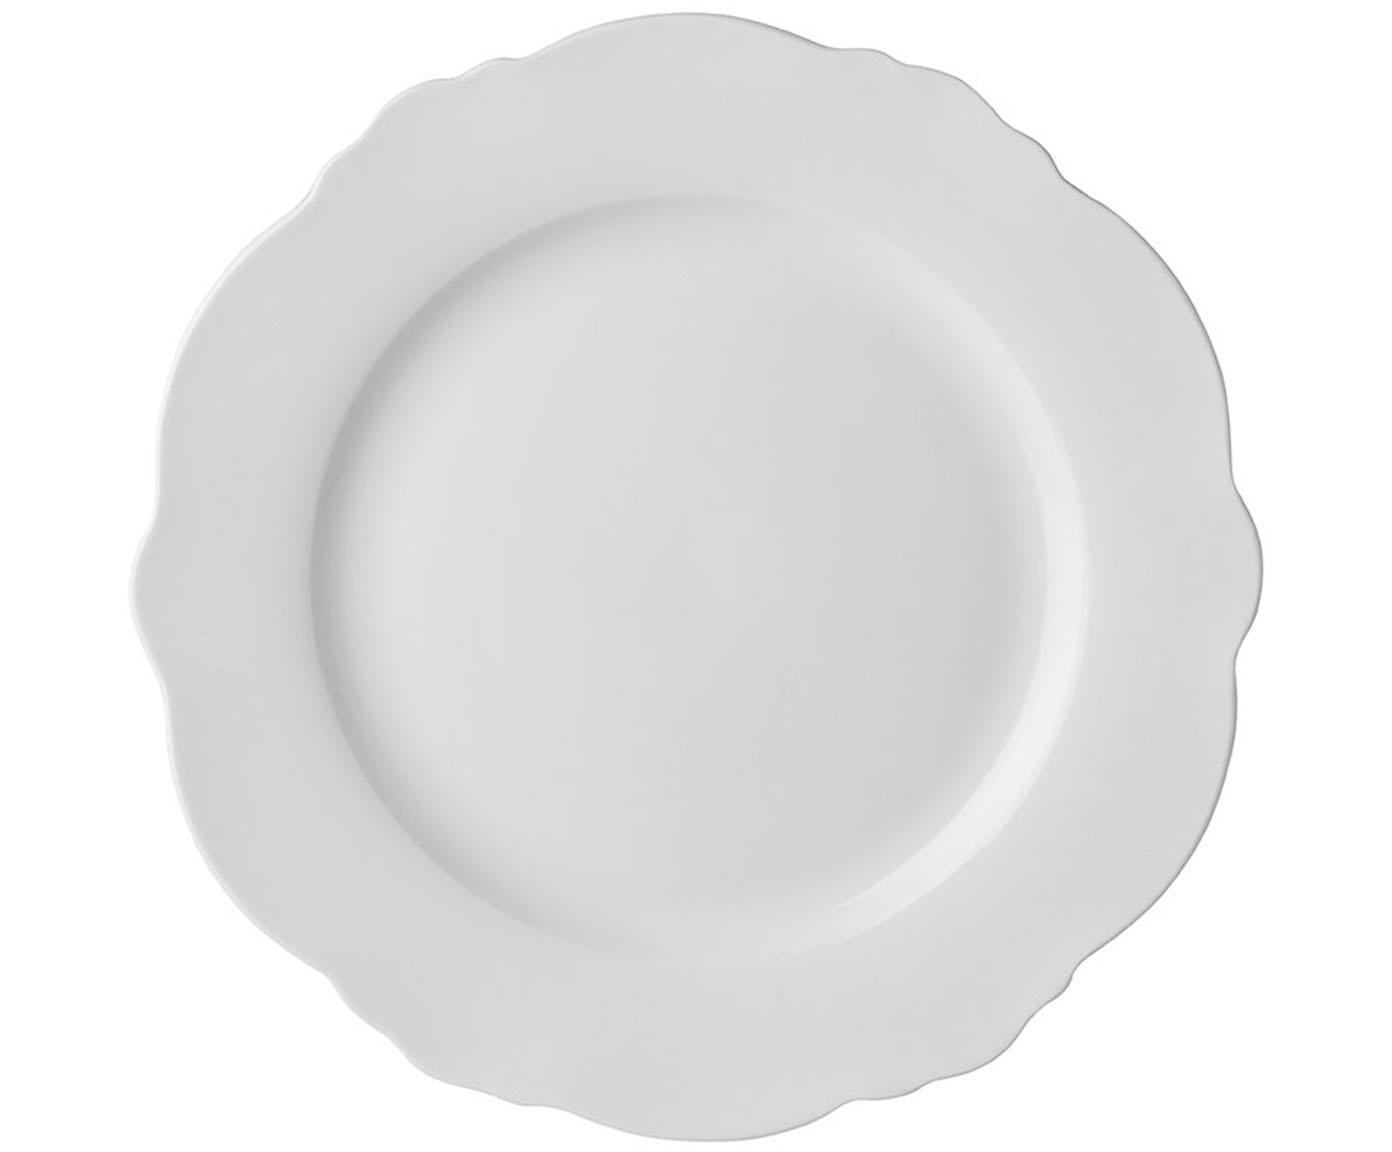 Platos postre Muschel Loft, 4uds., Porcelana, Blanco, Ø 21 x Al 2 cm